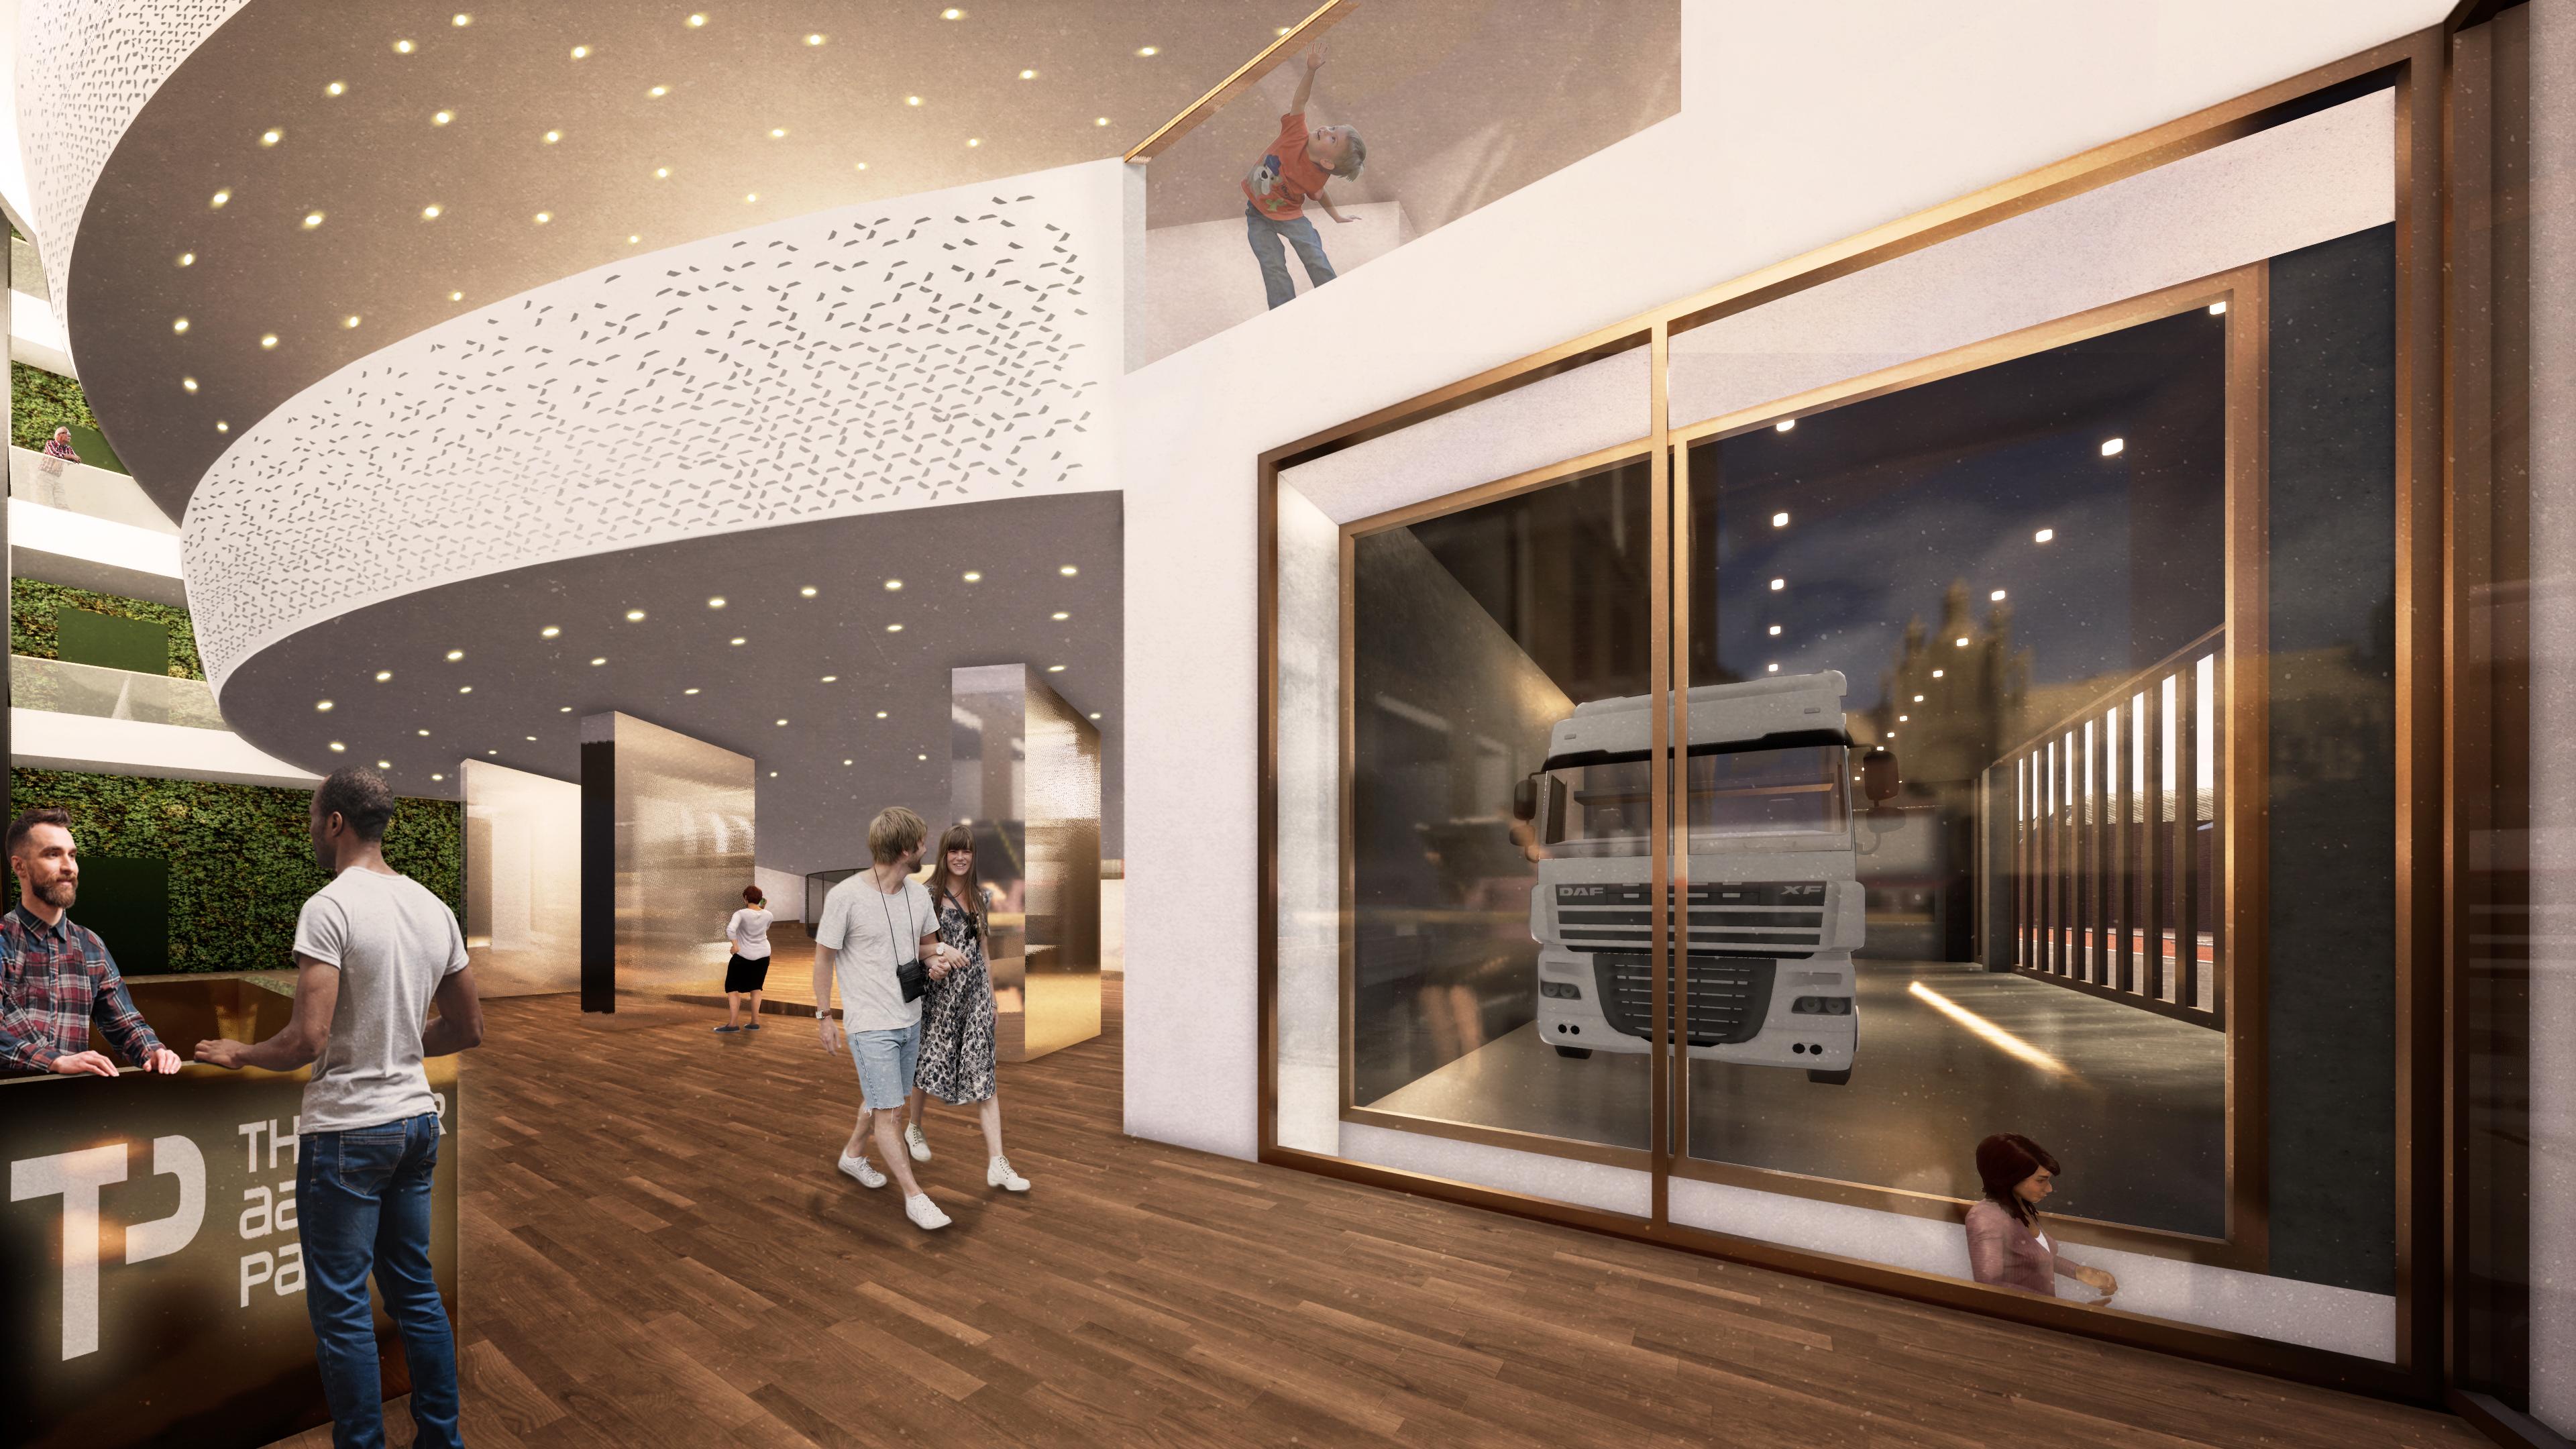 <p>Interieur entree-bali. Theater aan de Parade door NOAHH | Network Oriented Architecture</p>